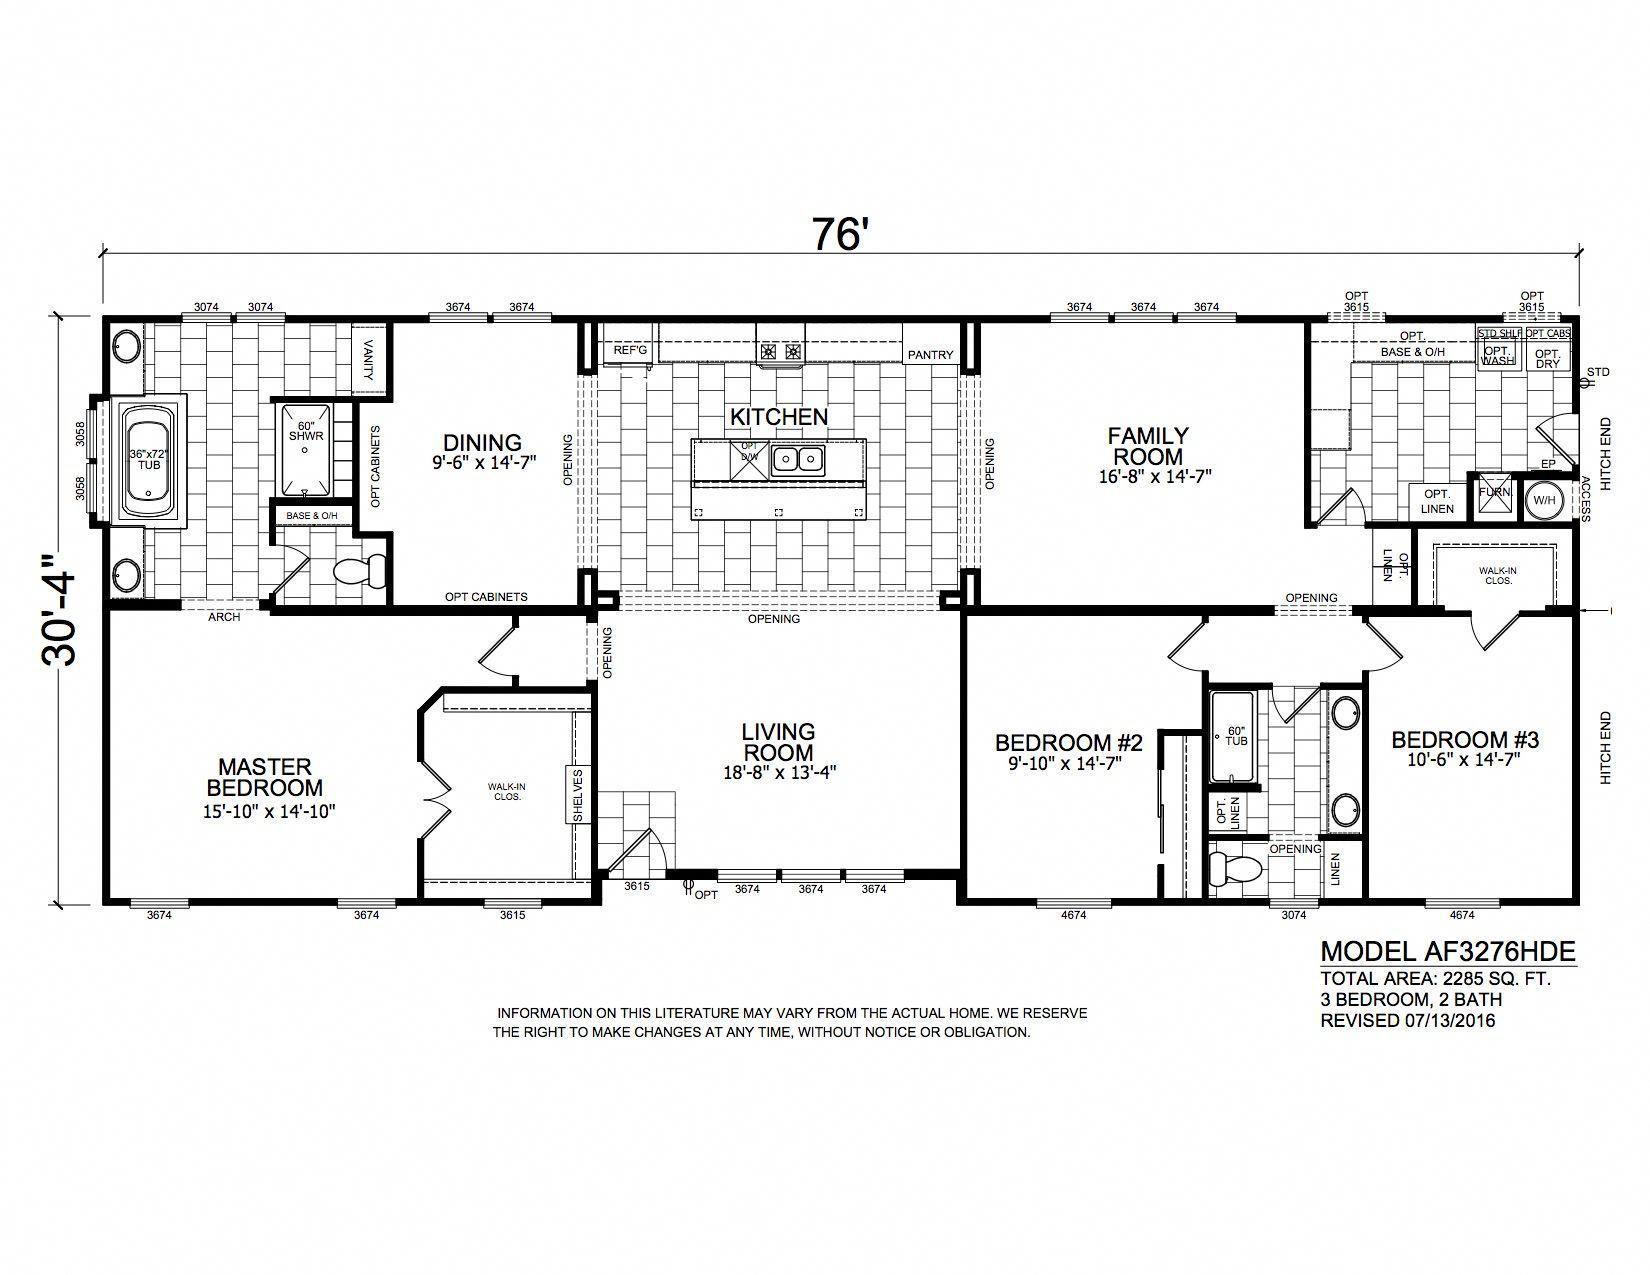 Cypress Modular home floor plans, Modular home plans